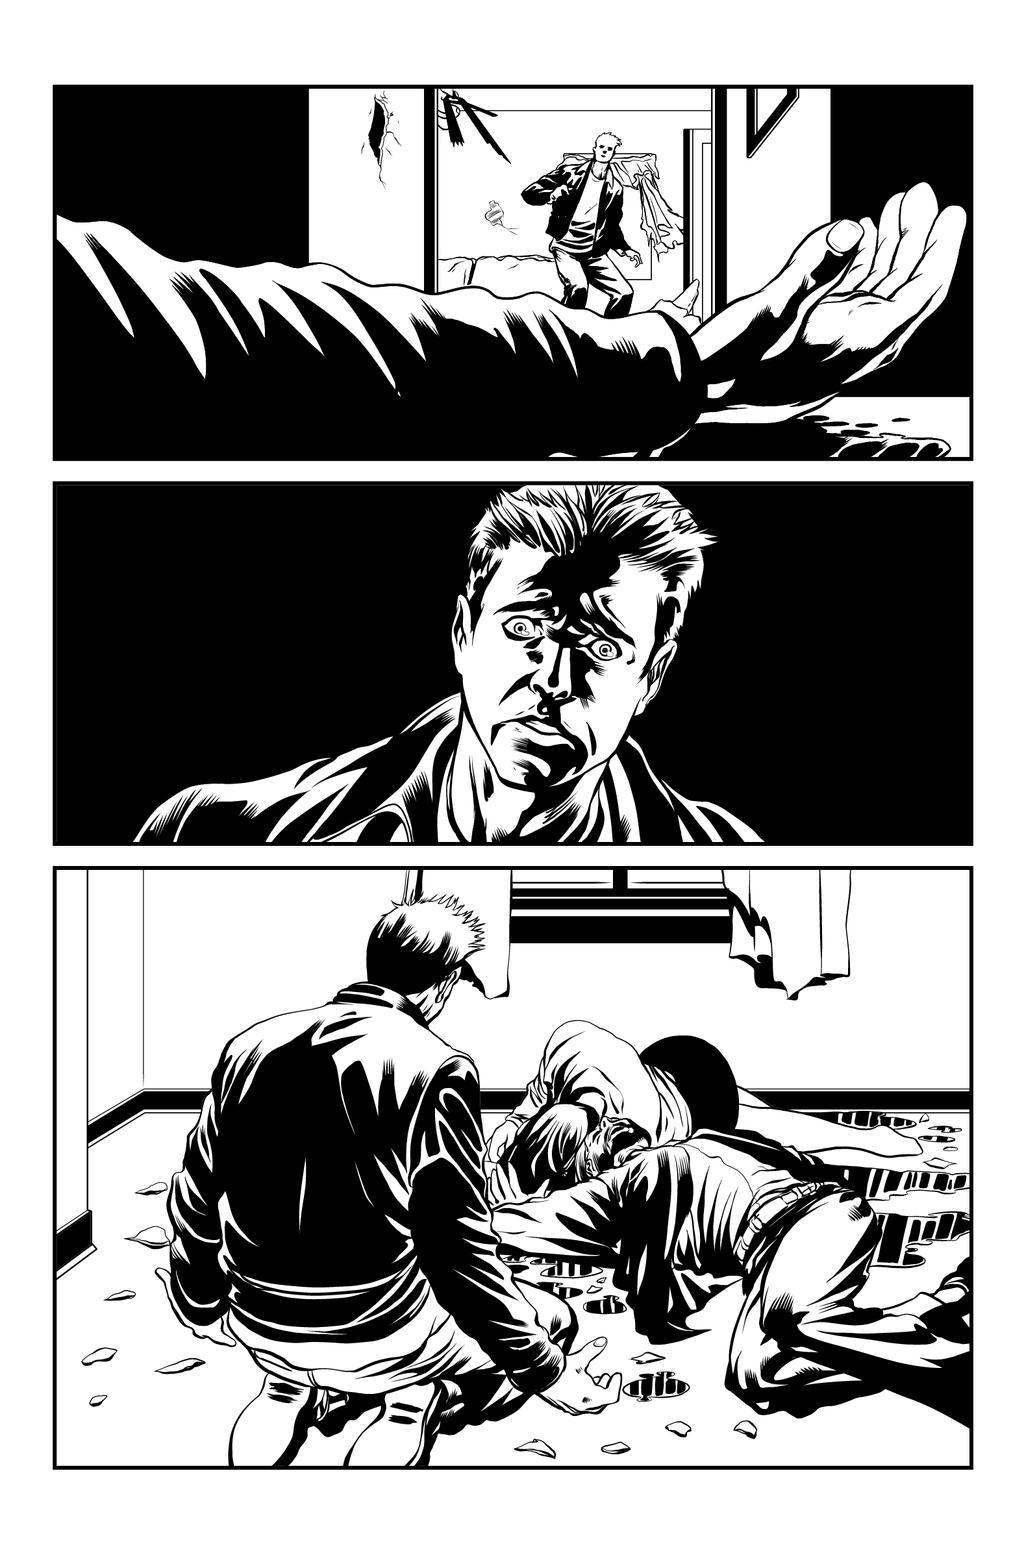 Chase pg 3 INKS by JeremiahLambertArt